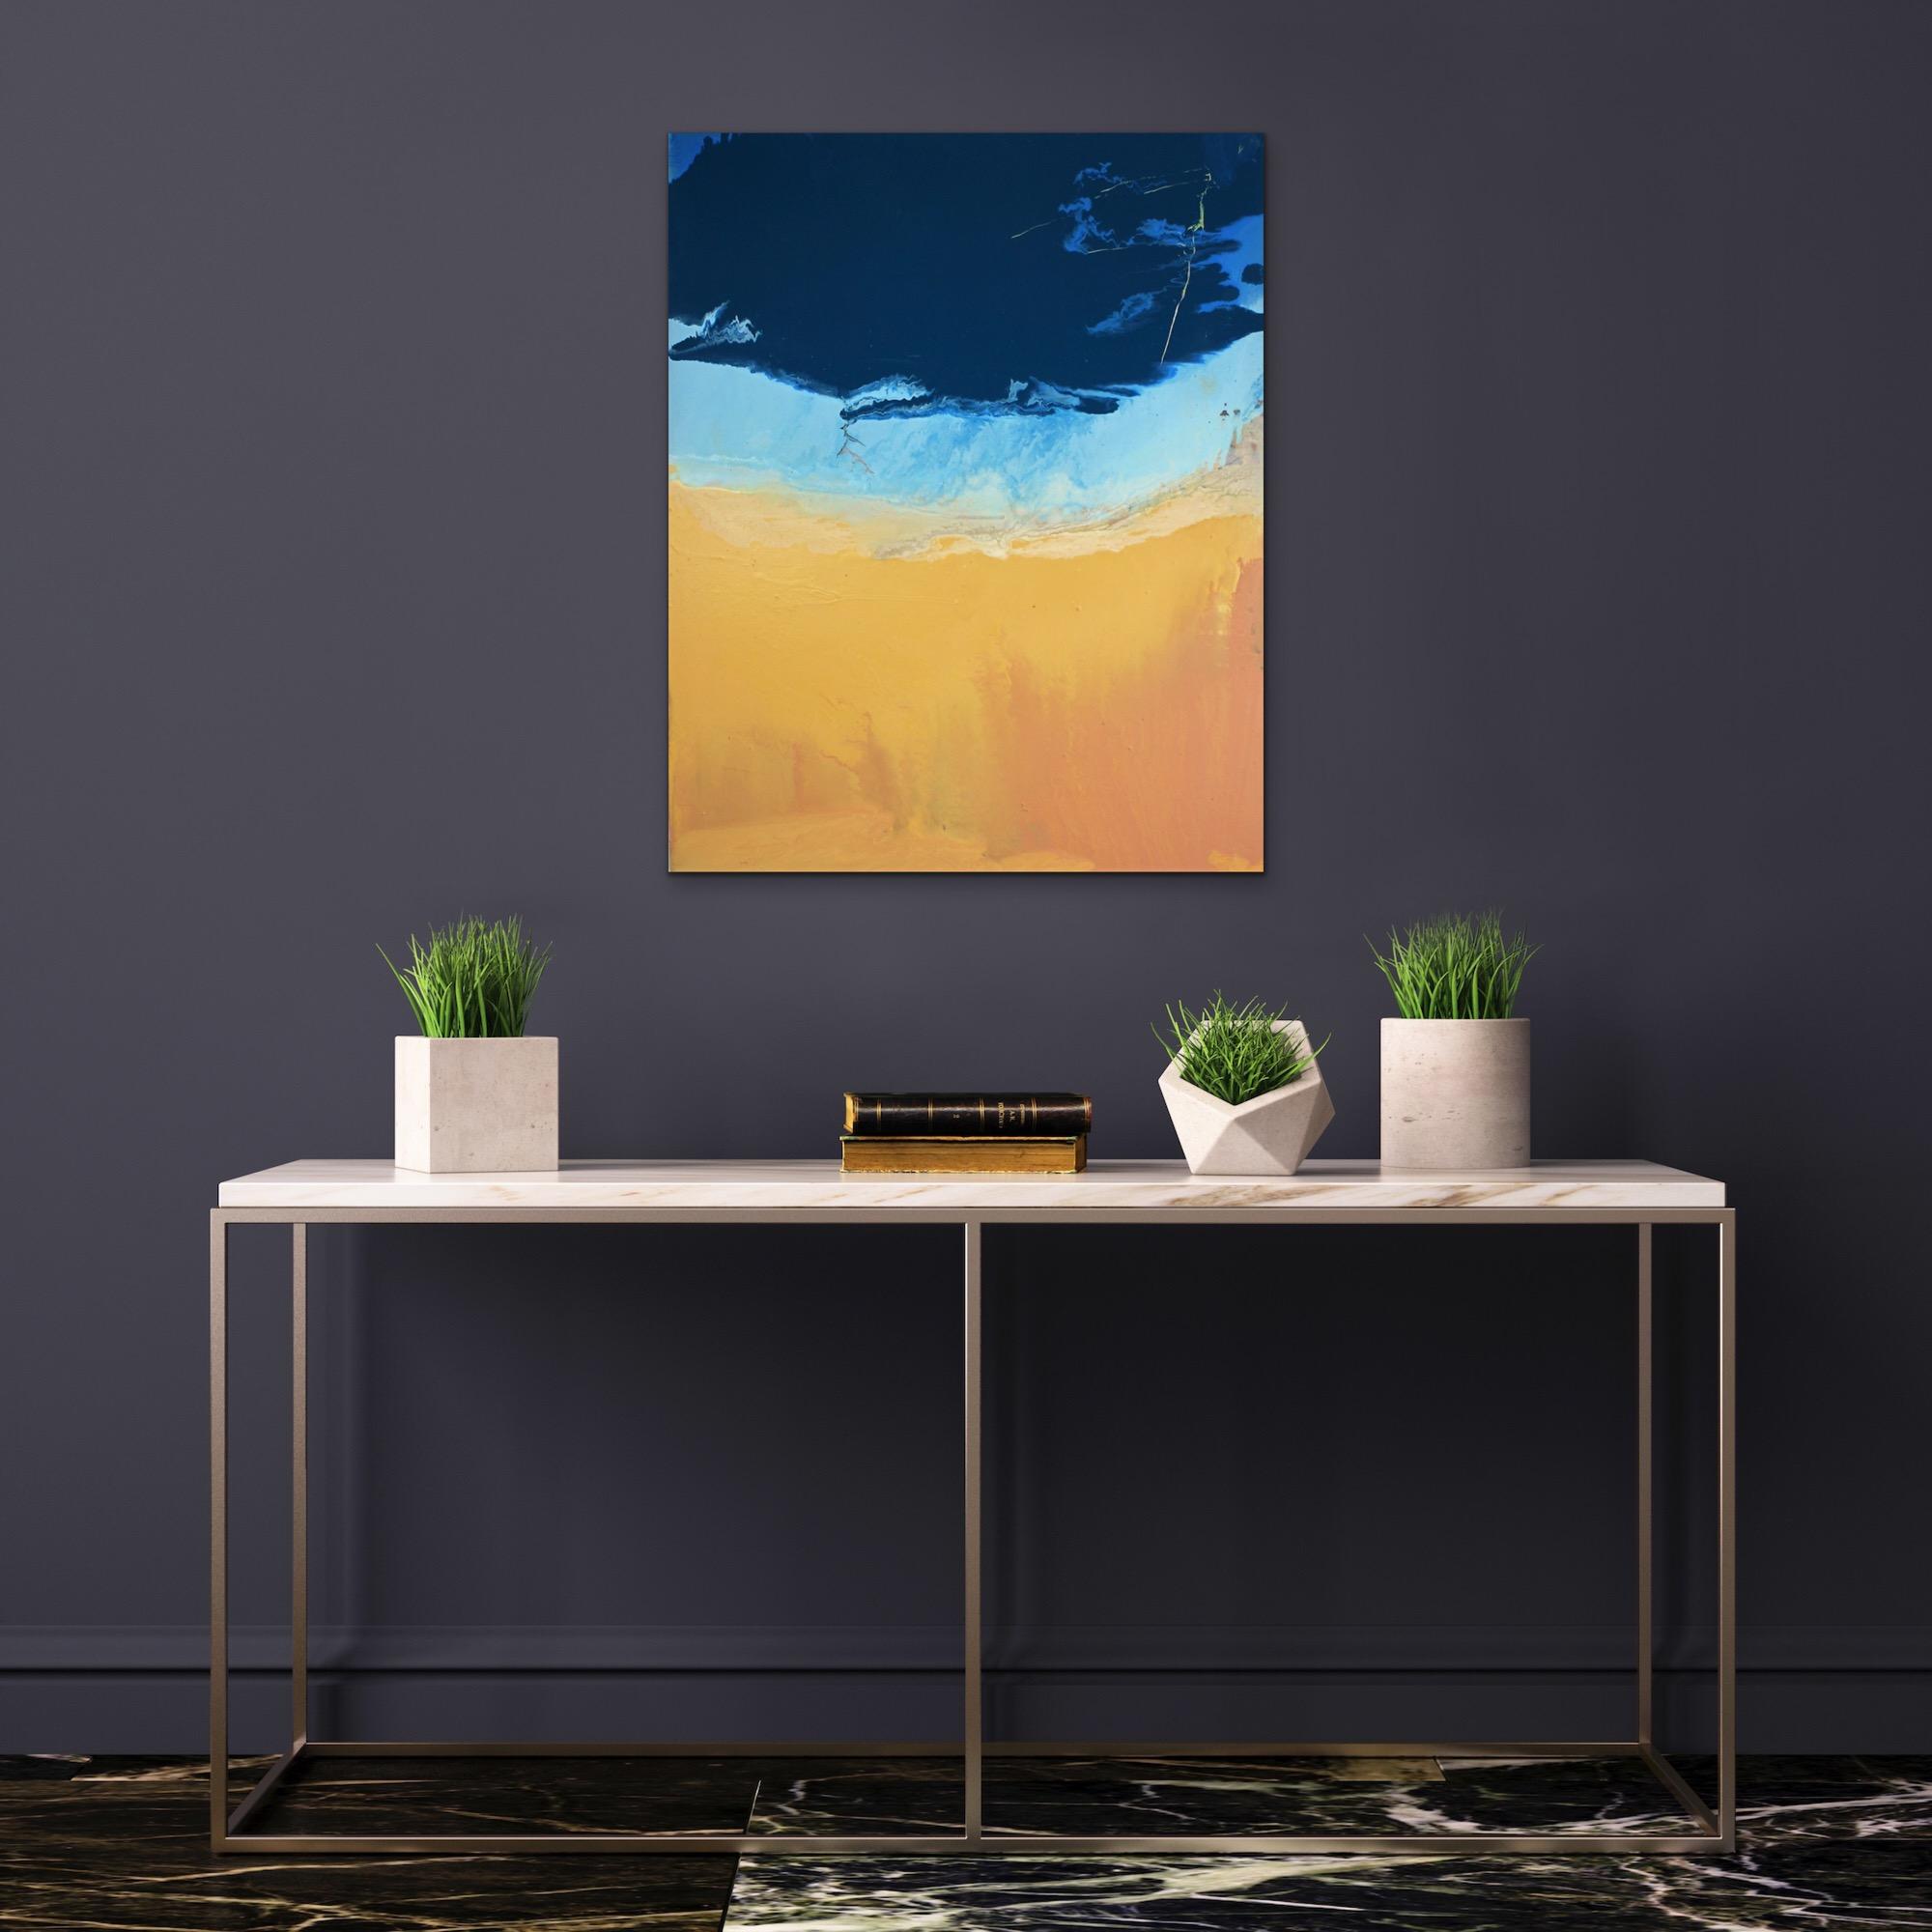 Mudflats and Saltmarsh, 2019 (oil on canvas)